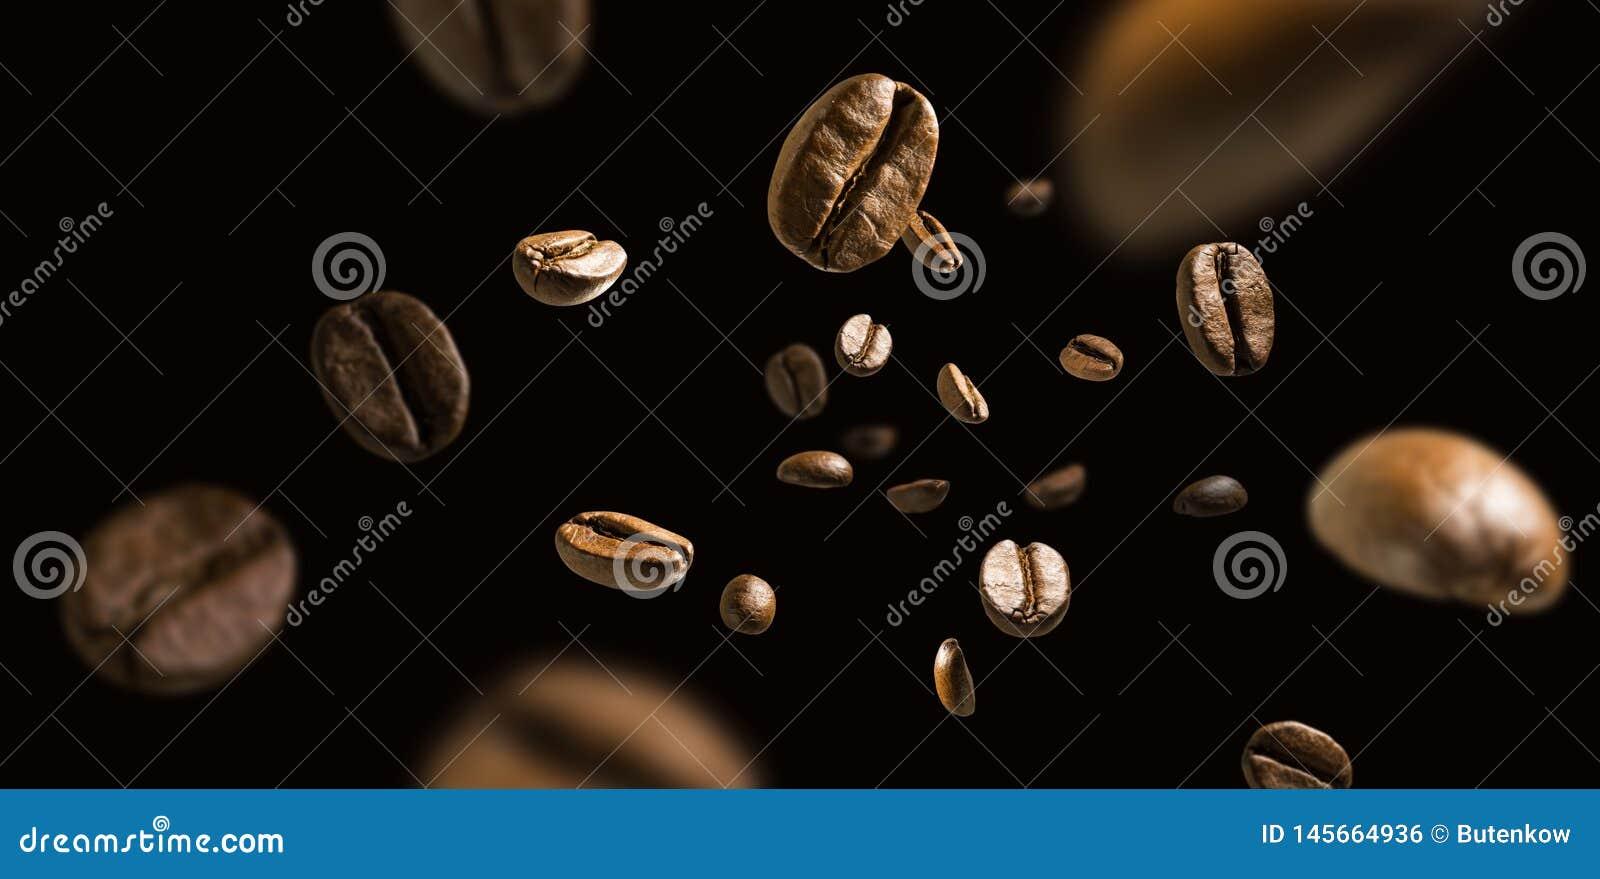 Coffee beans in flight on a dark background